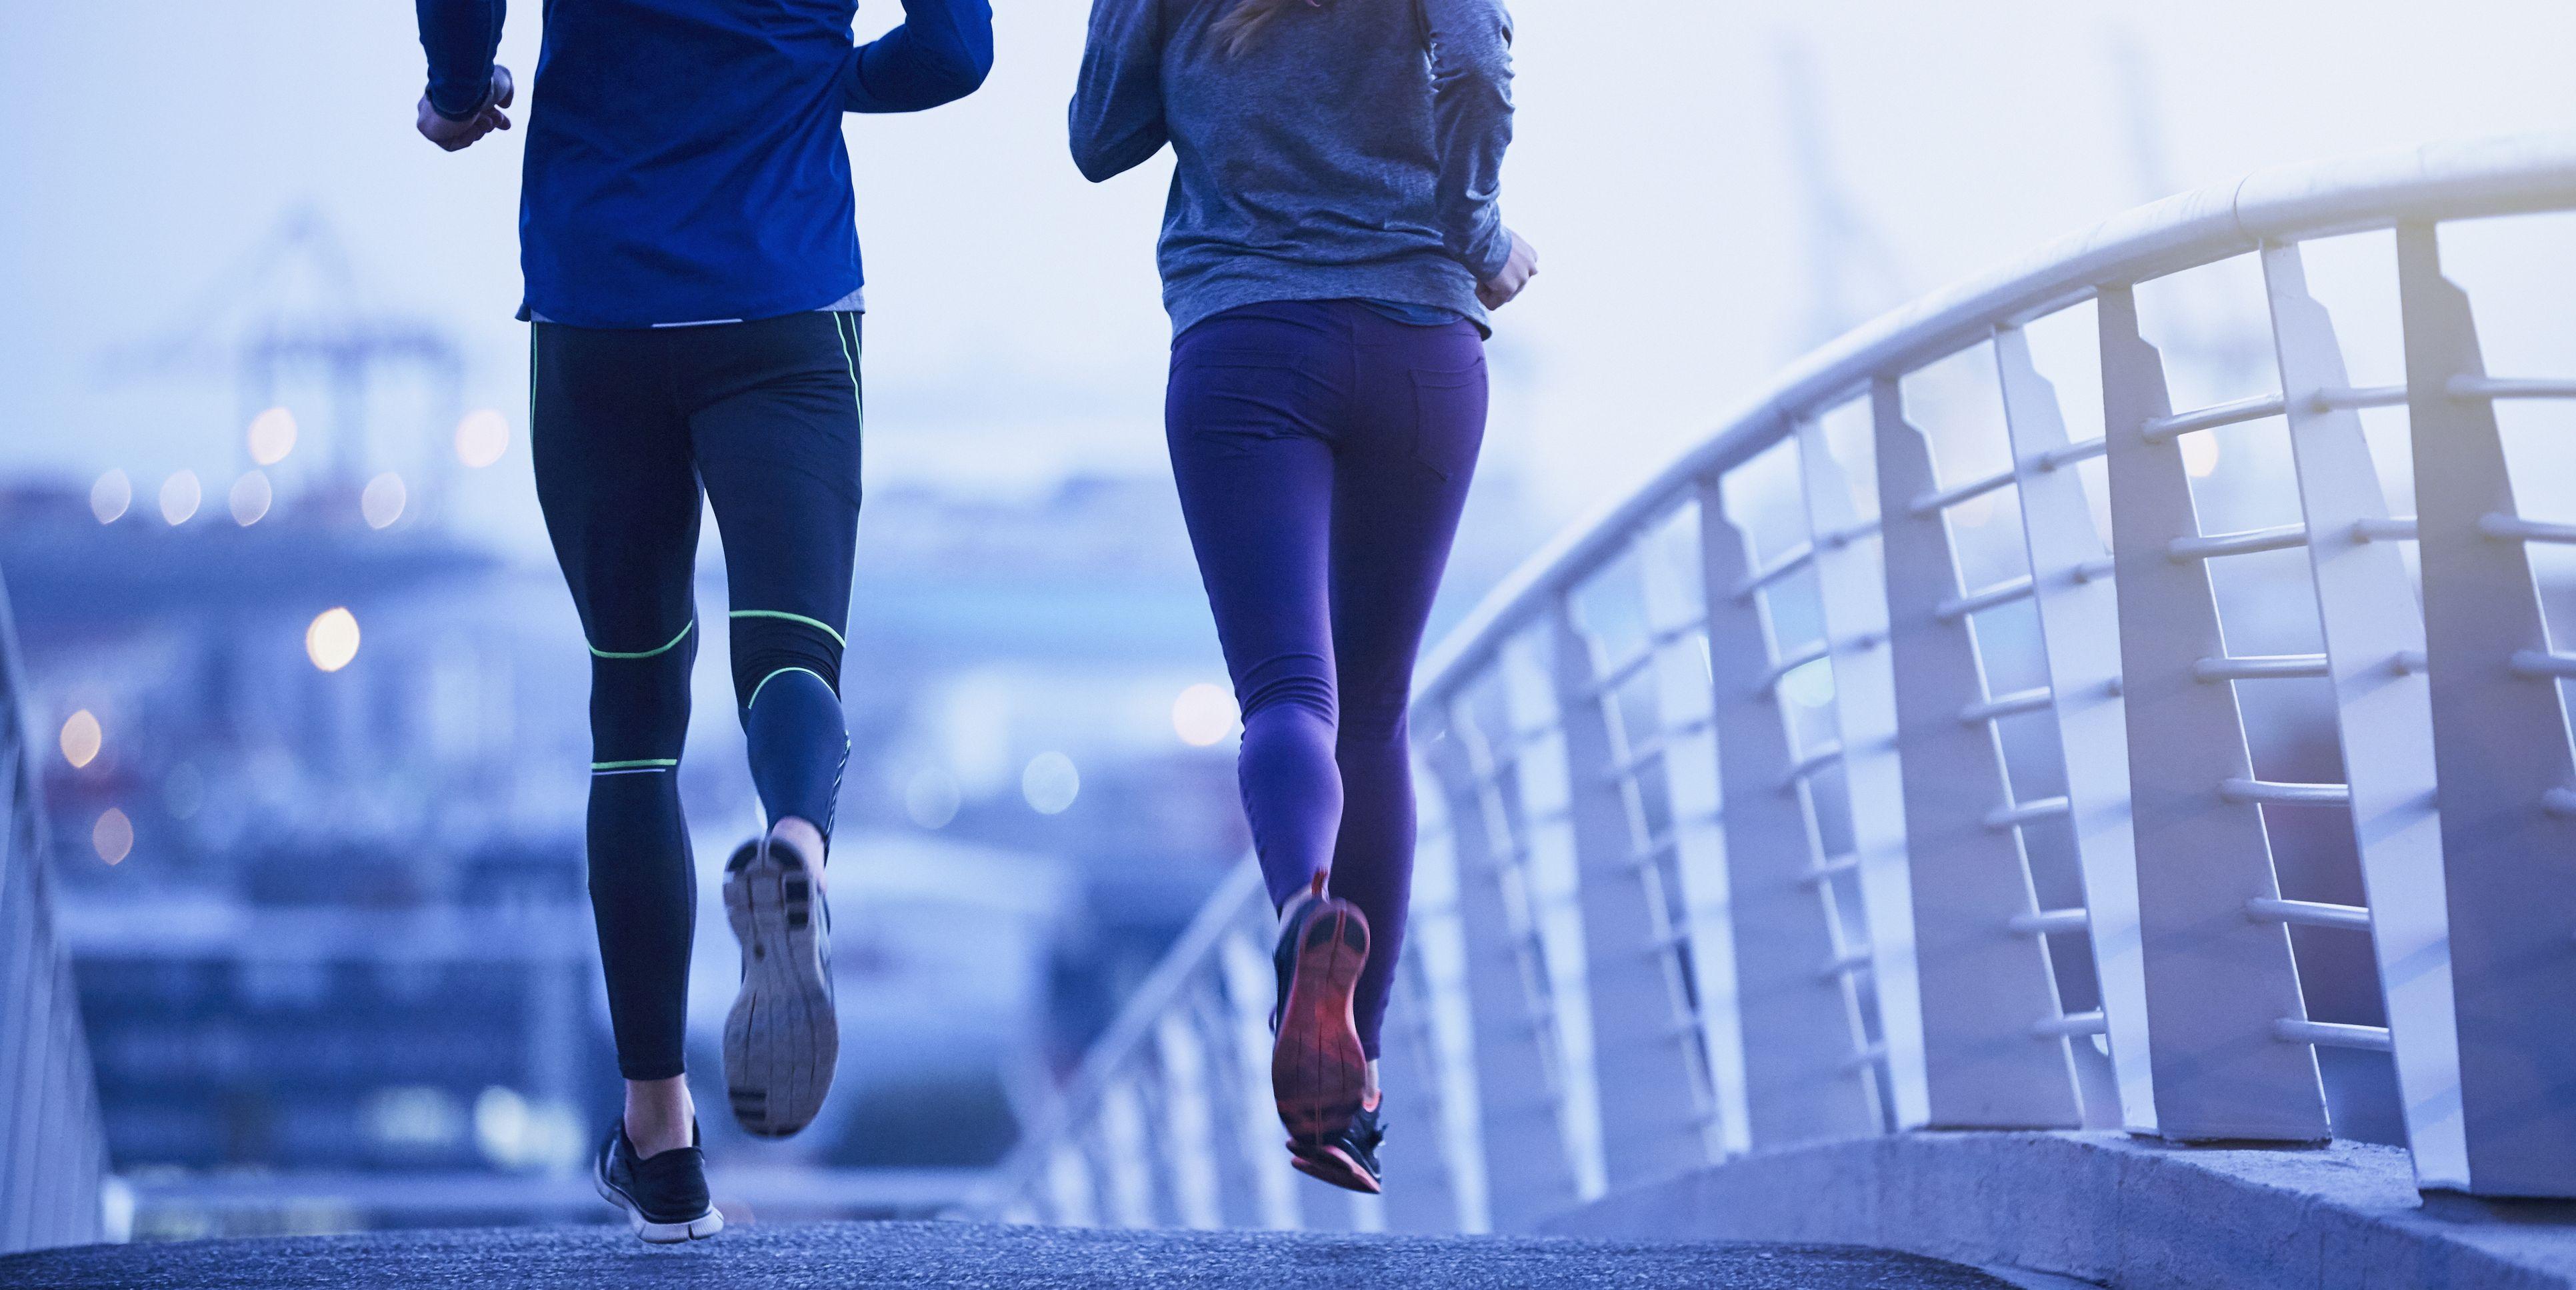 Runner-couple-running-on-urban-footbridge-at-dawn-royalty-free-image-691051677-1531864532.jpg?crop=1.00xw:0.751xh;0,0